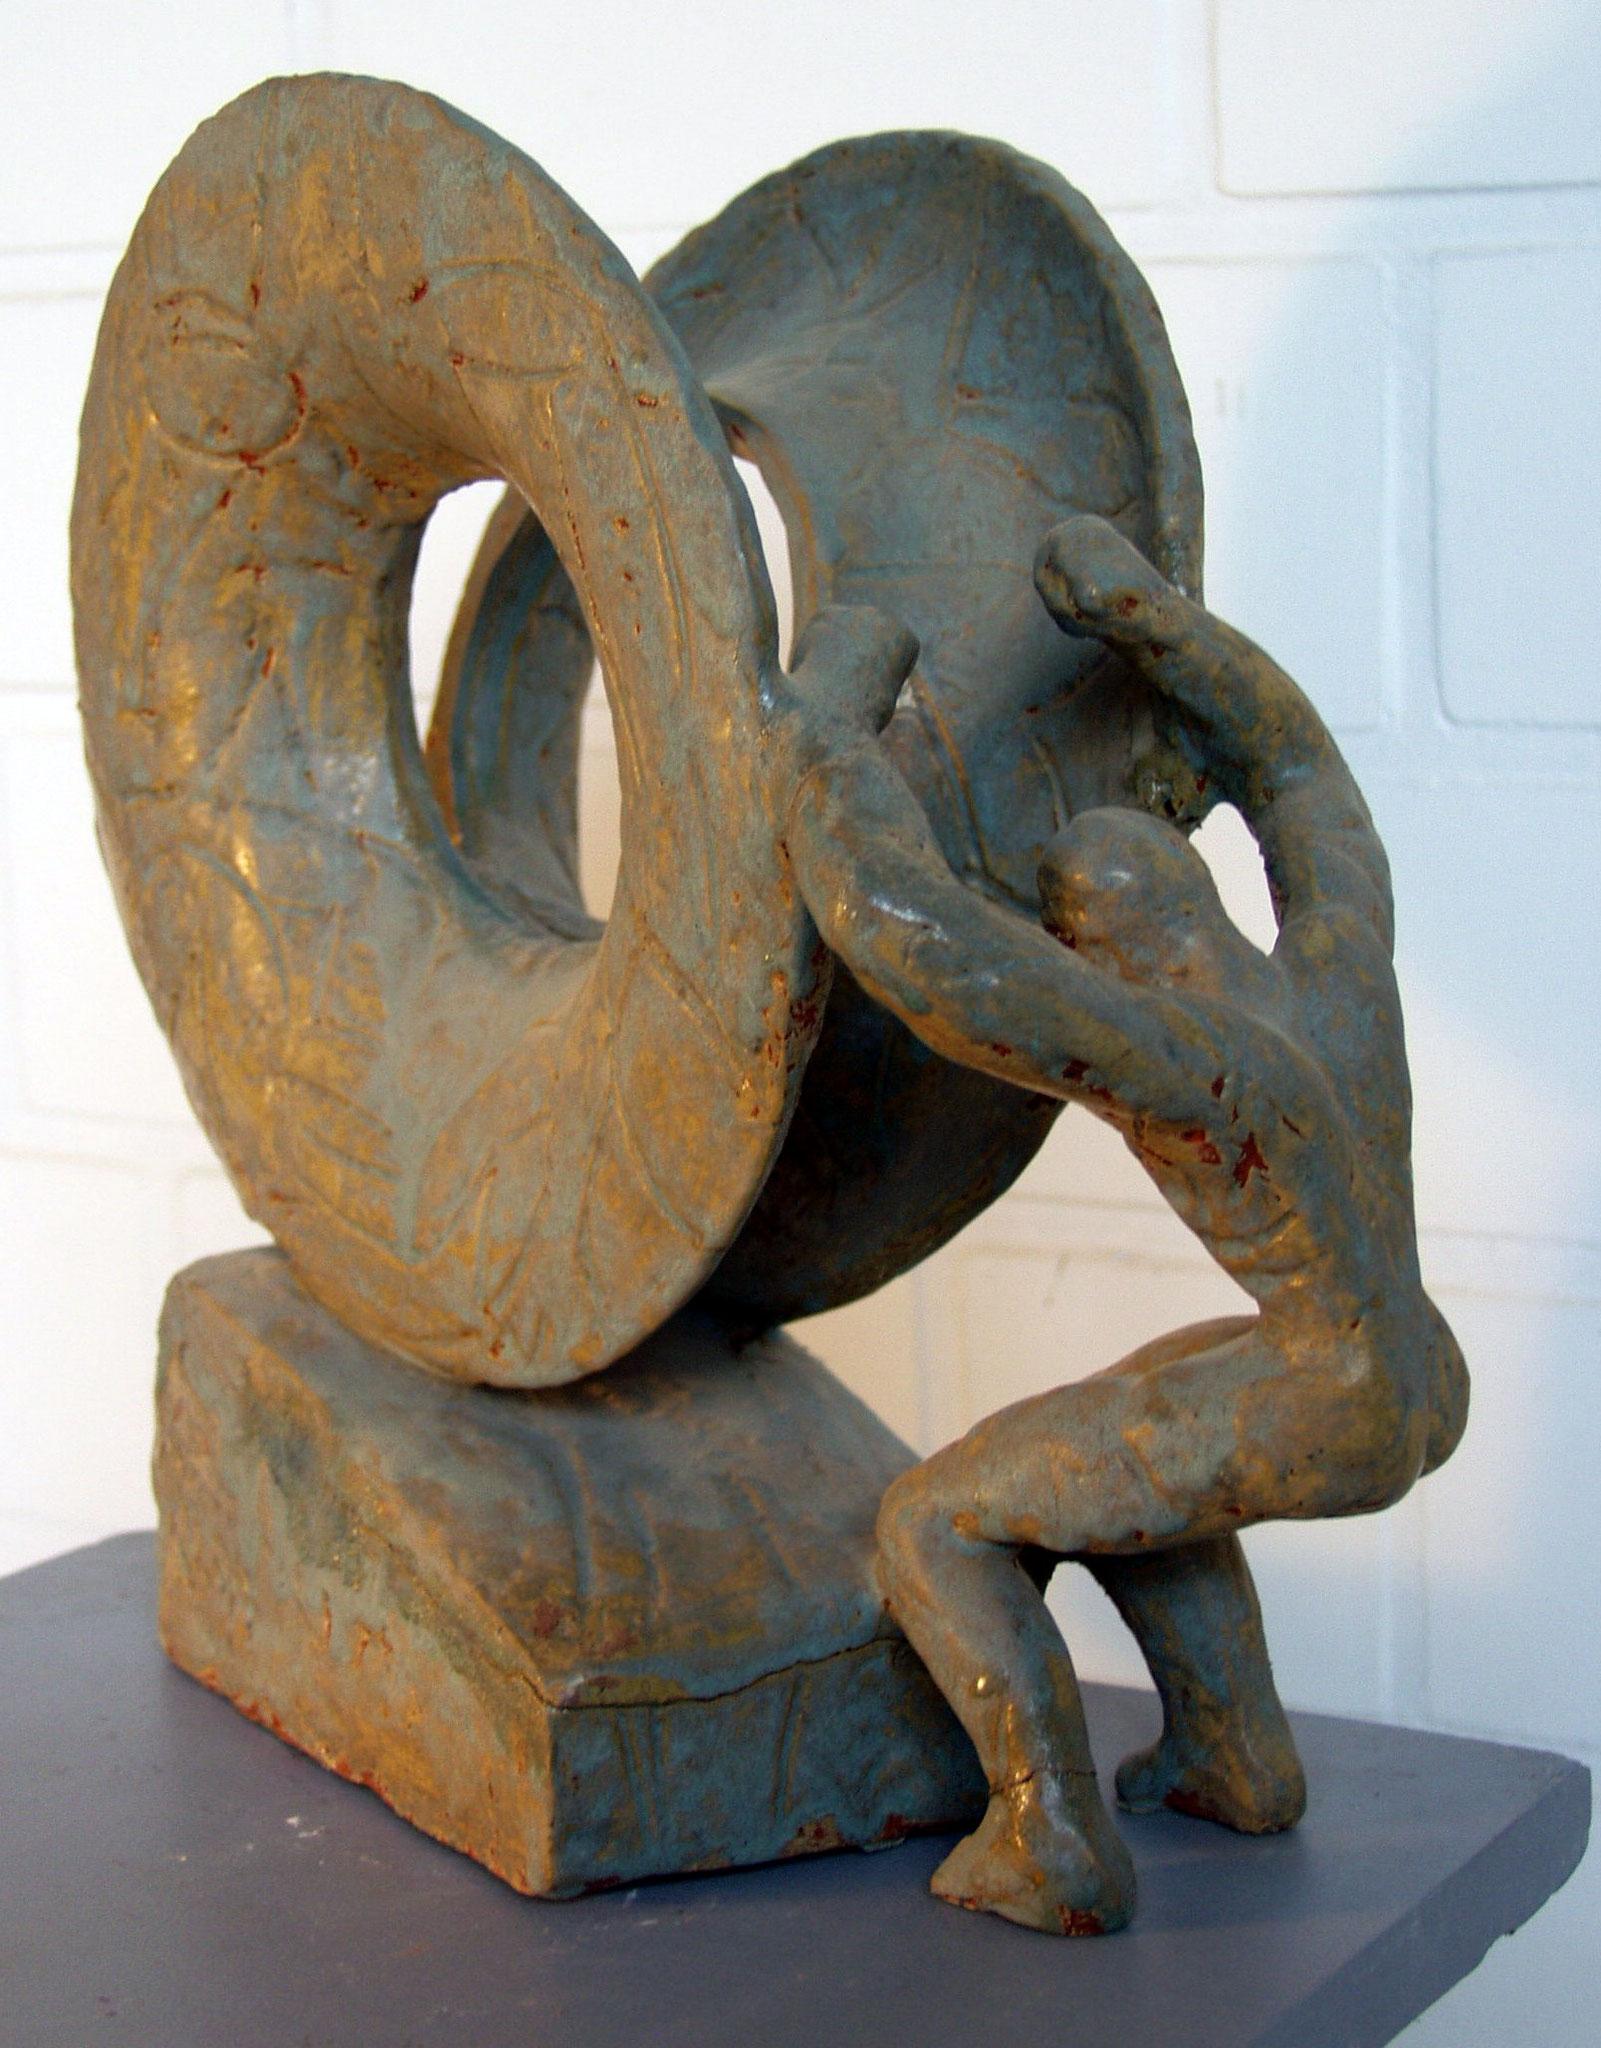 Sisyphus, roter Ton, Höhe = 31 cm